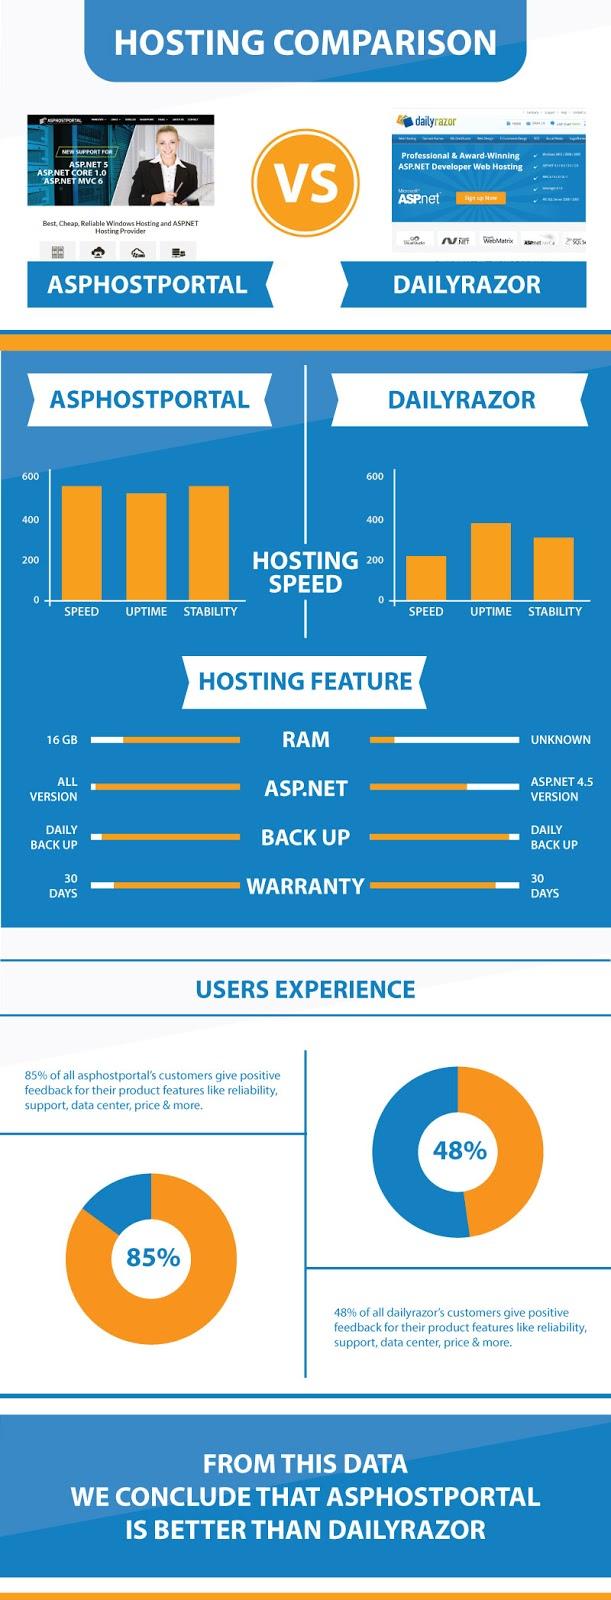 ASP.NET Core 1.0 Hosting Comparison | ASPHostPortal Vs DailyRazor | Explained With Infographic